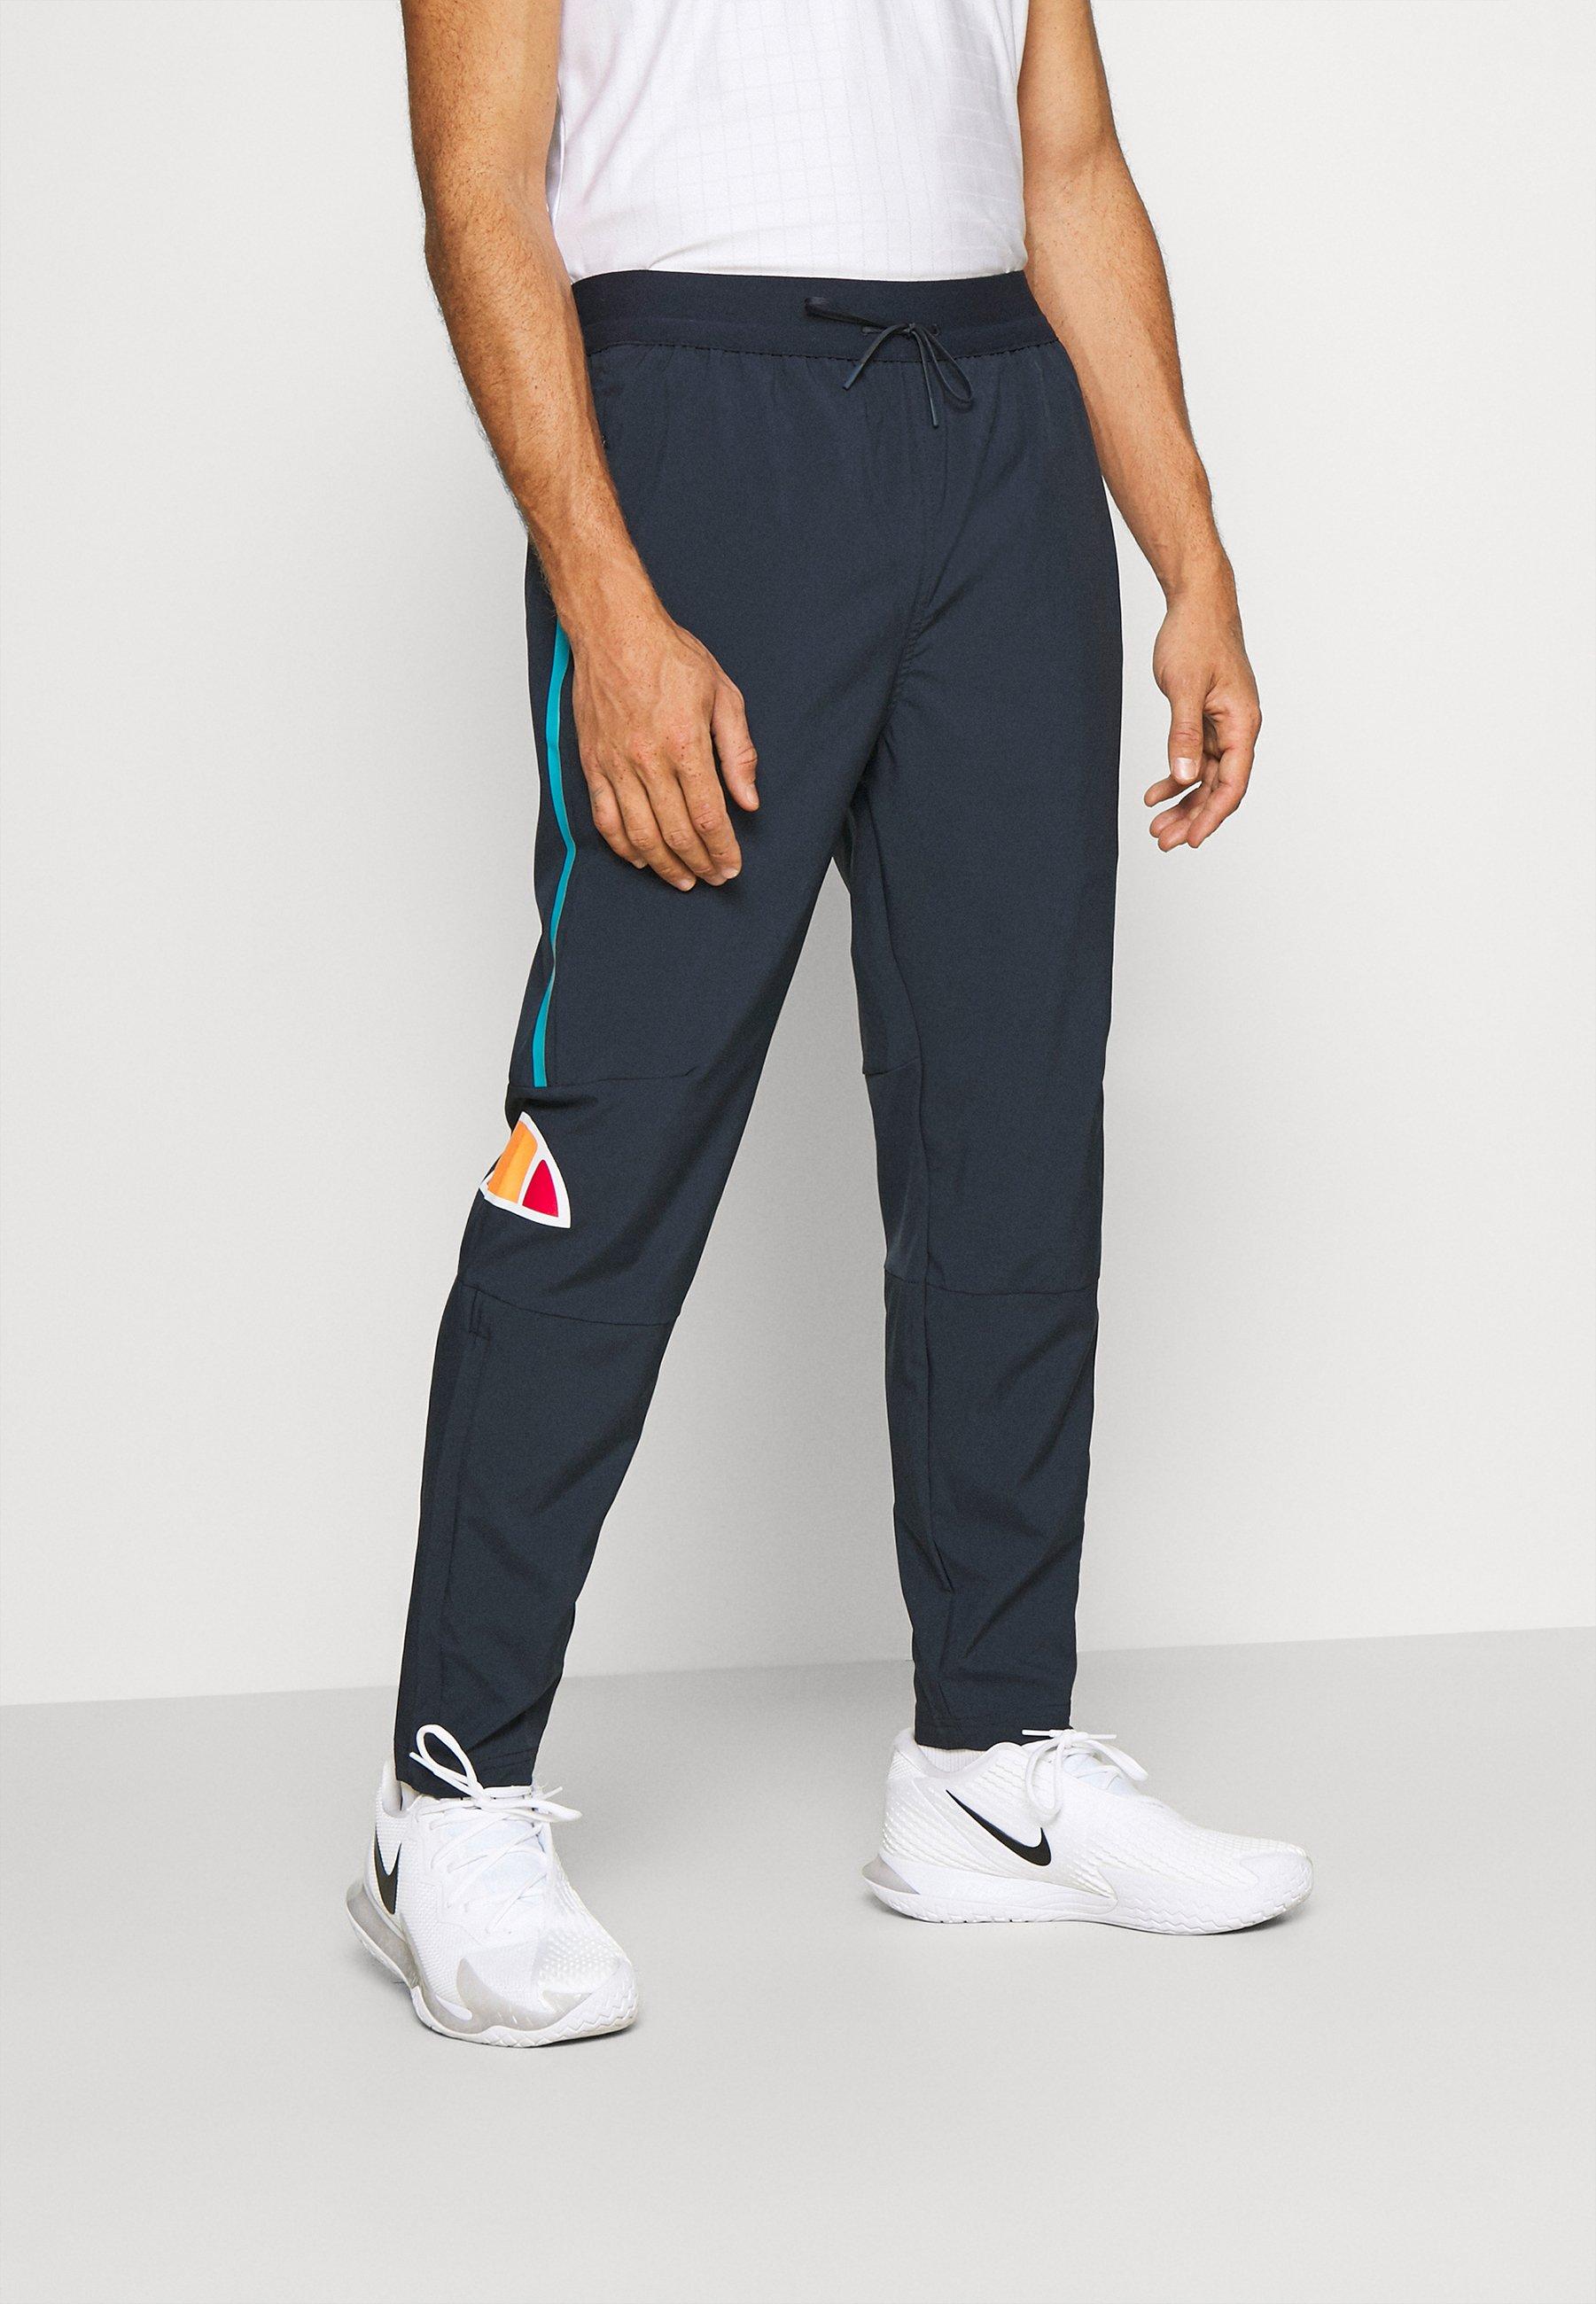 Uomo CENNO TRACK PANT - Pantaloni